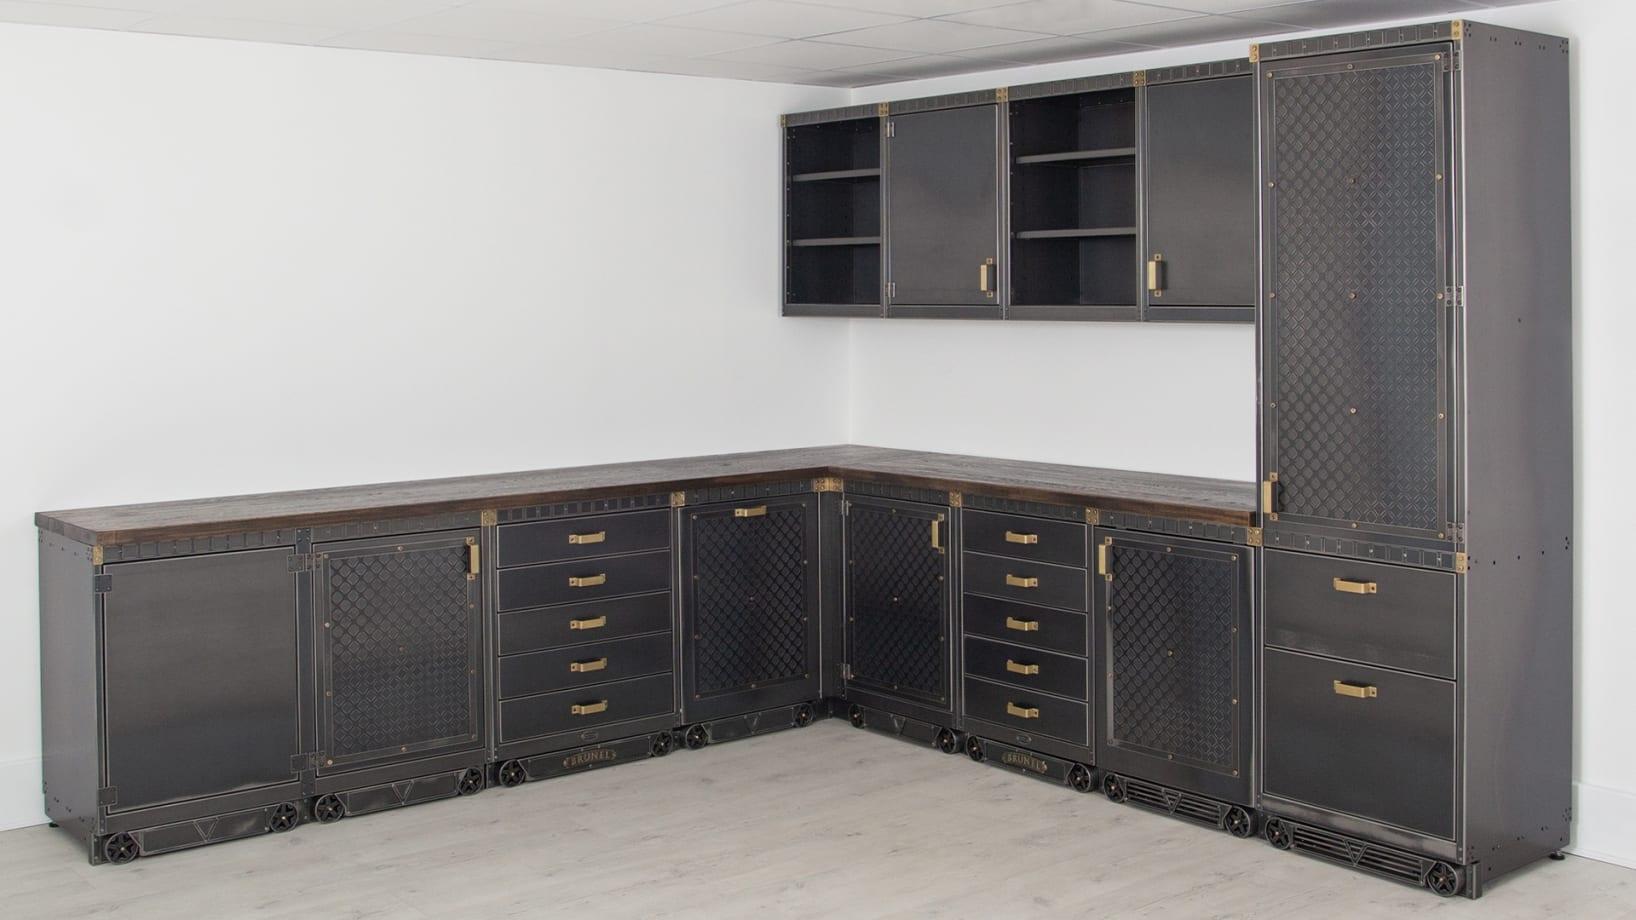 Steel Vintage Brunel Kitchen